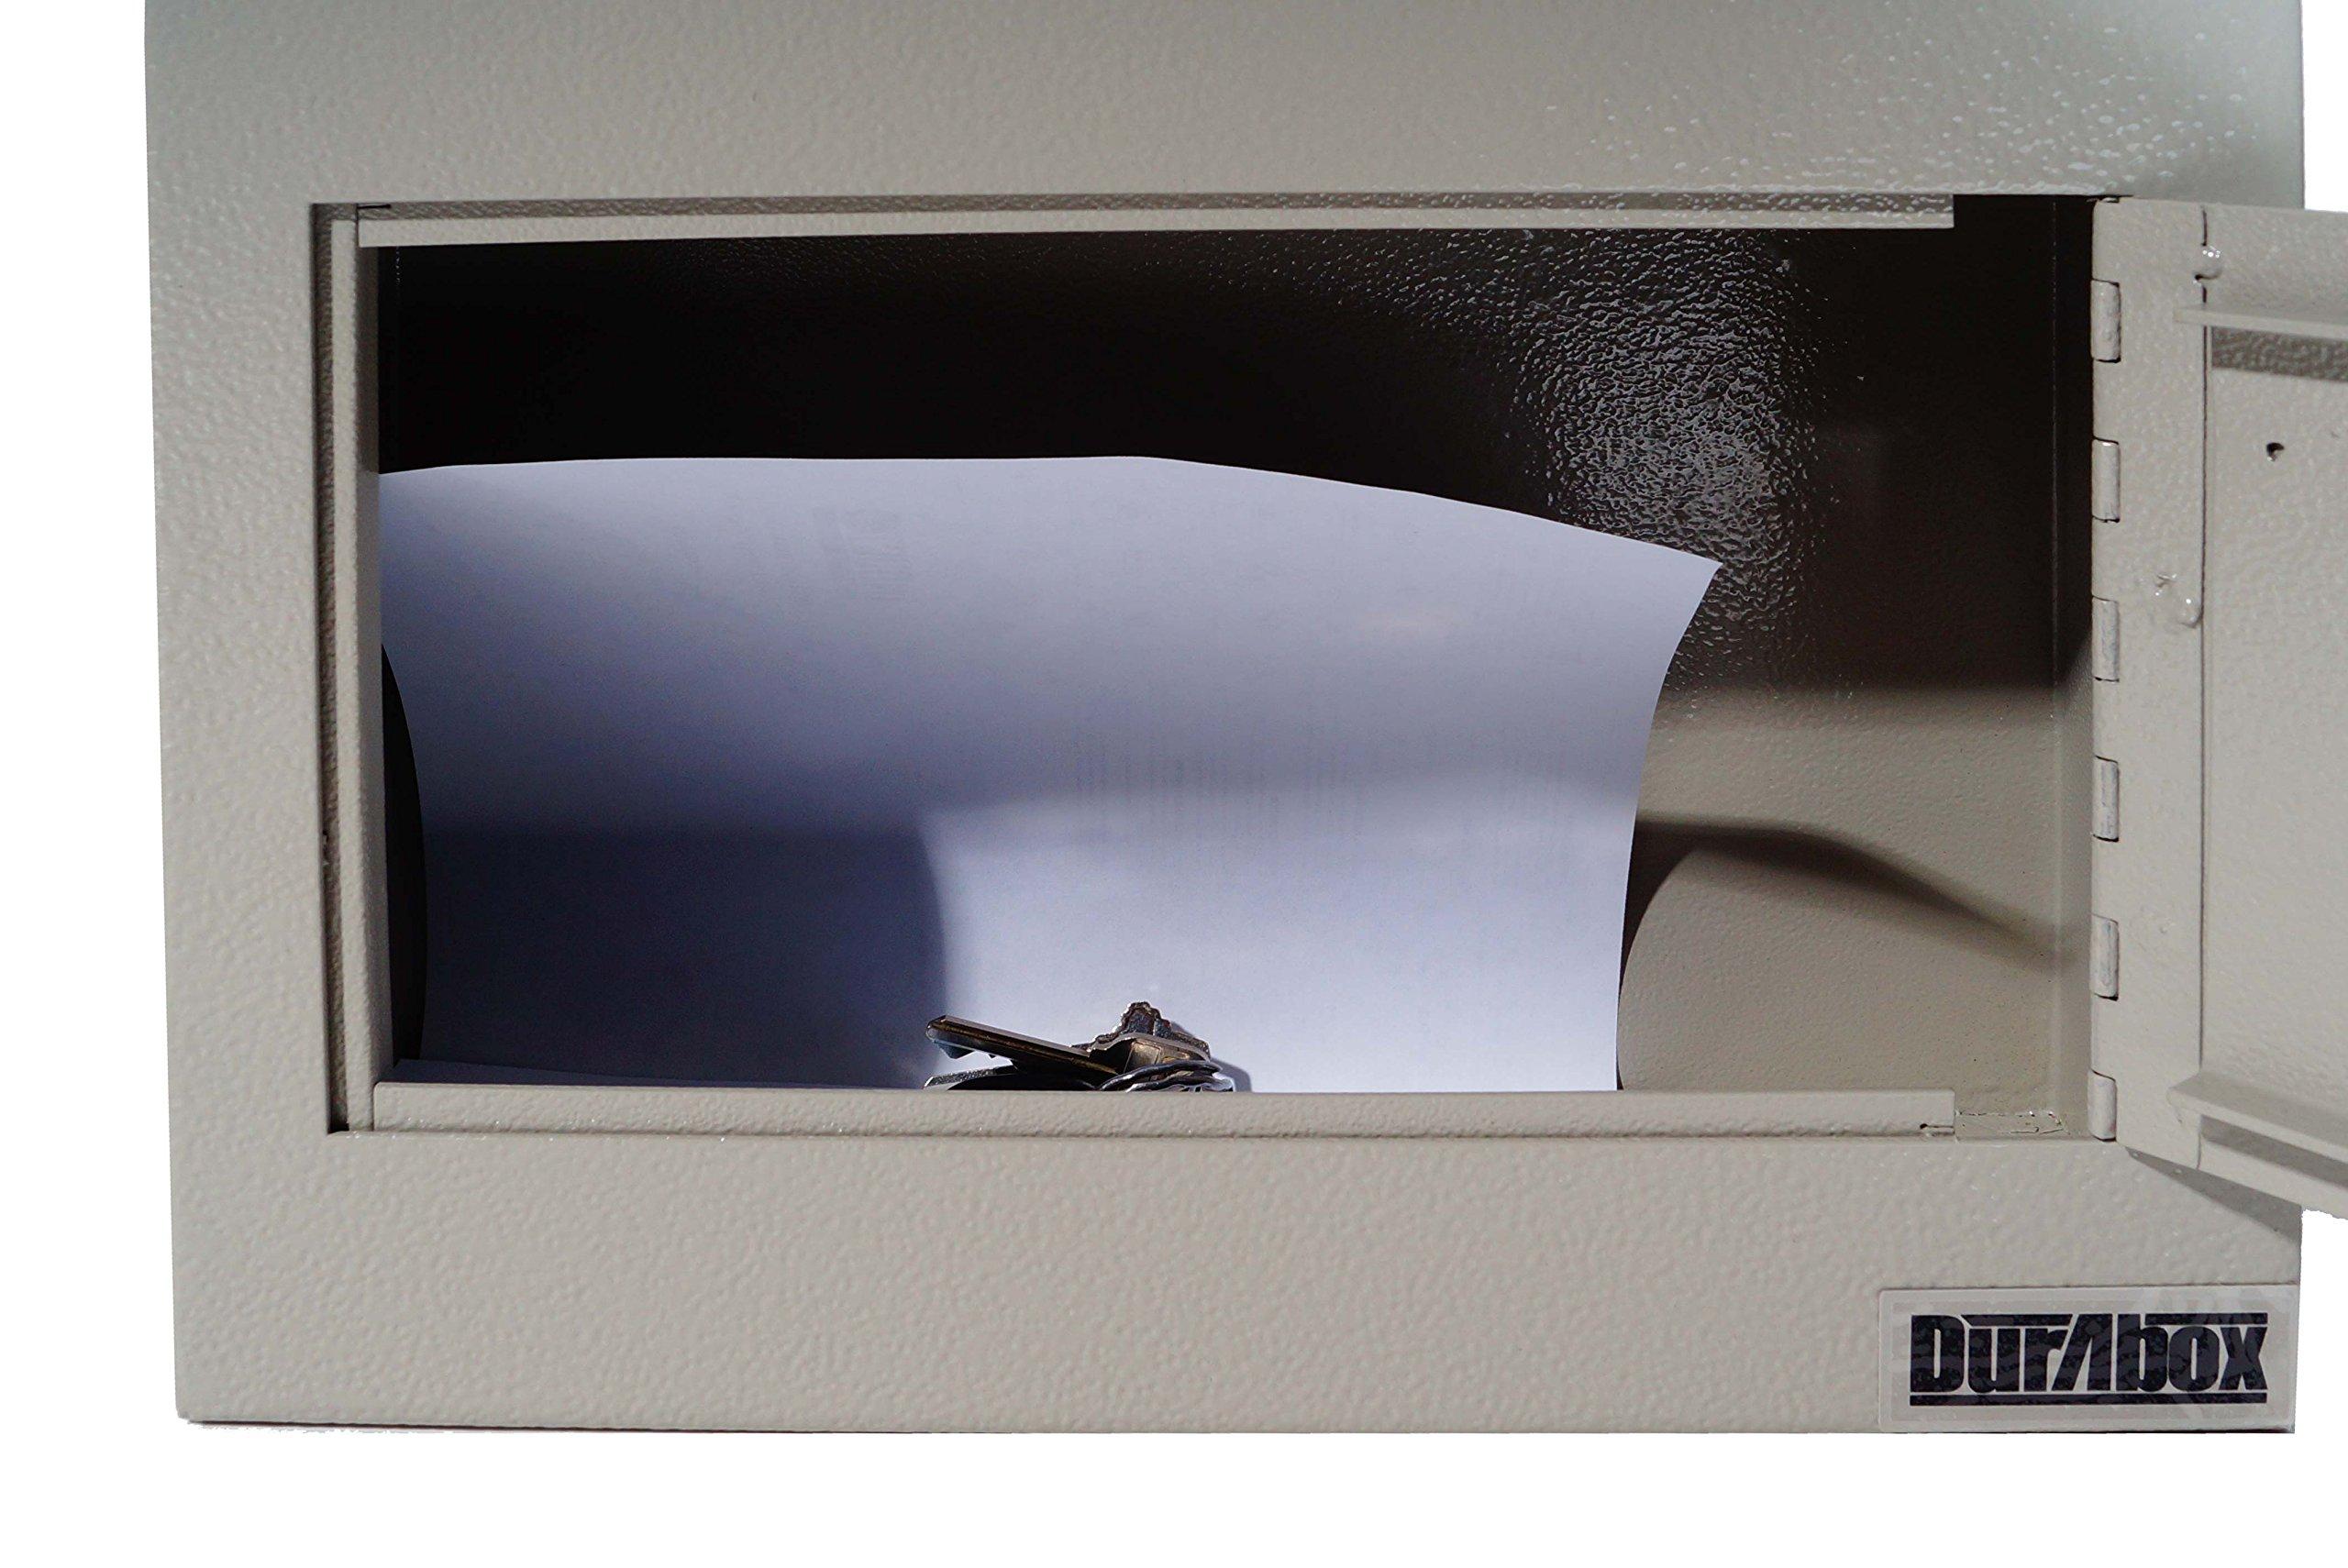 DuraBox Wall Mount Locking Deposit Drop Box Safe (W500) by DuraBox